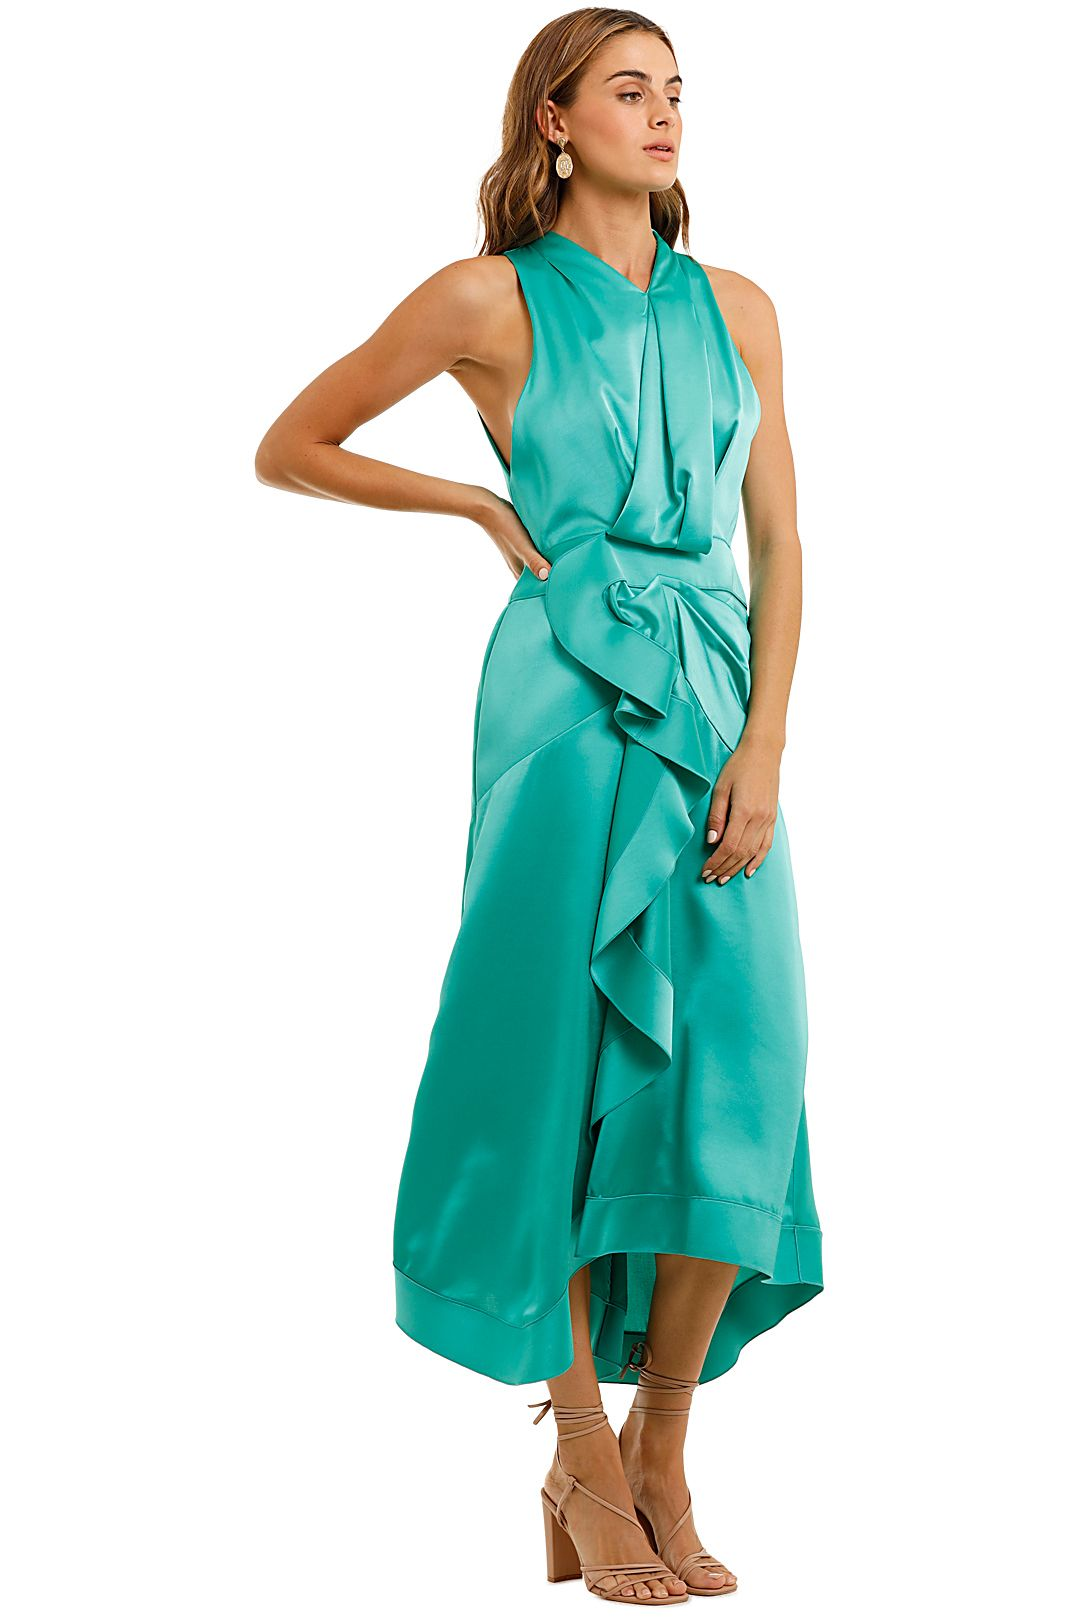 Acler Millbank Dress Green Ruffles